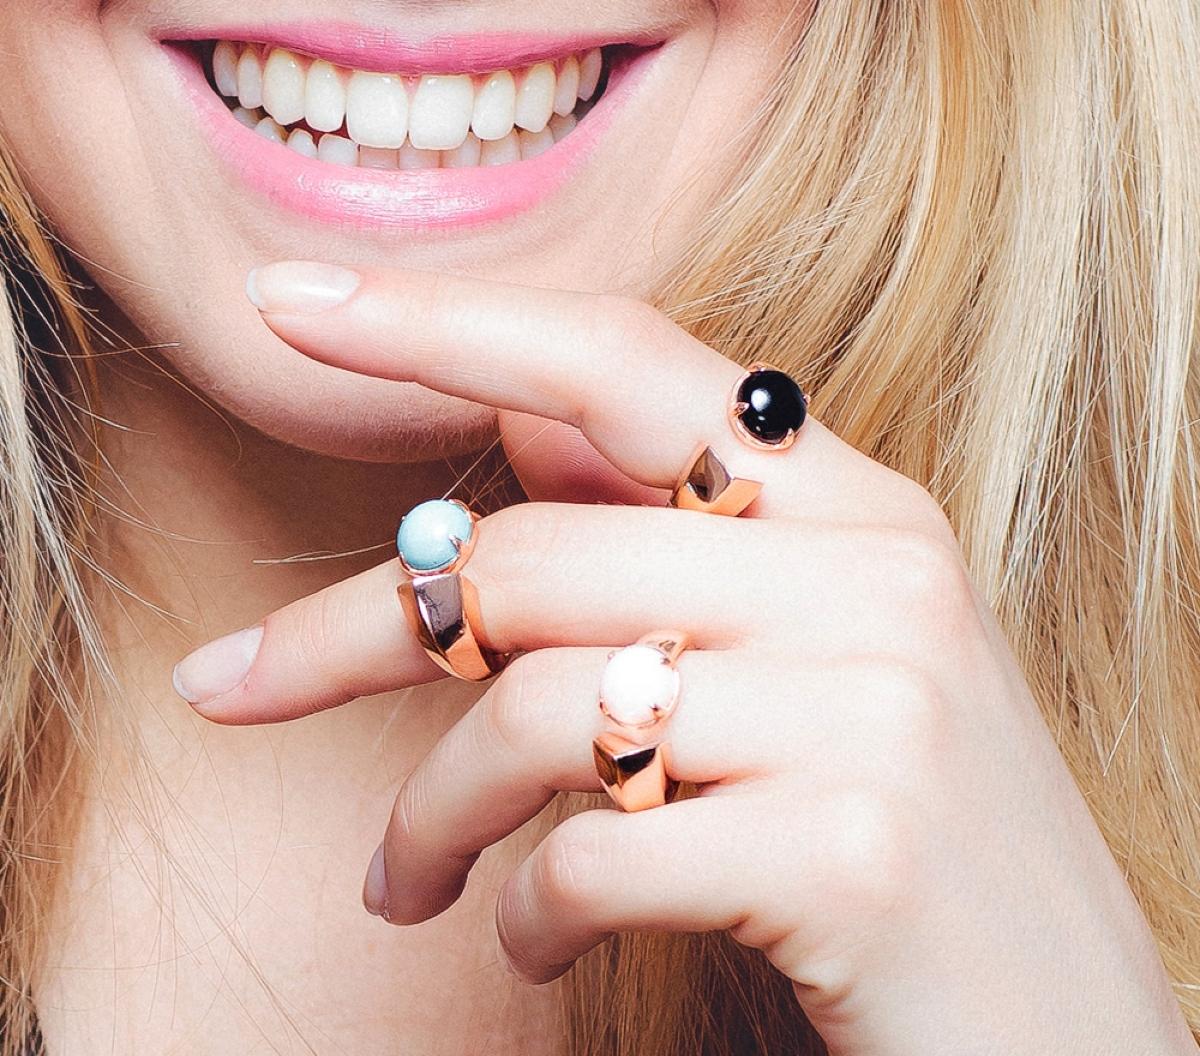 Bijoux précieux close up jeu